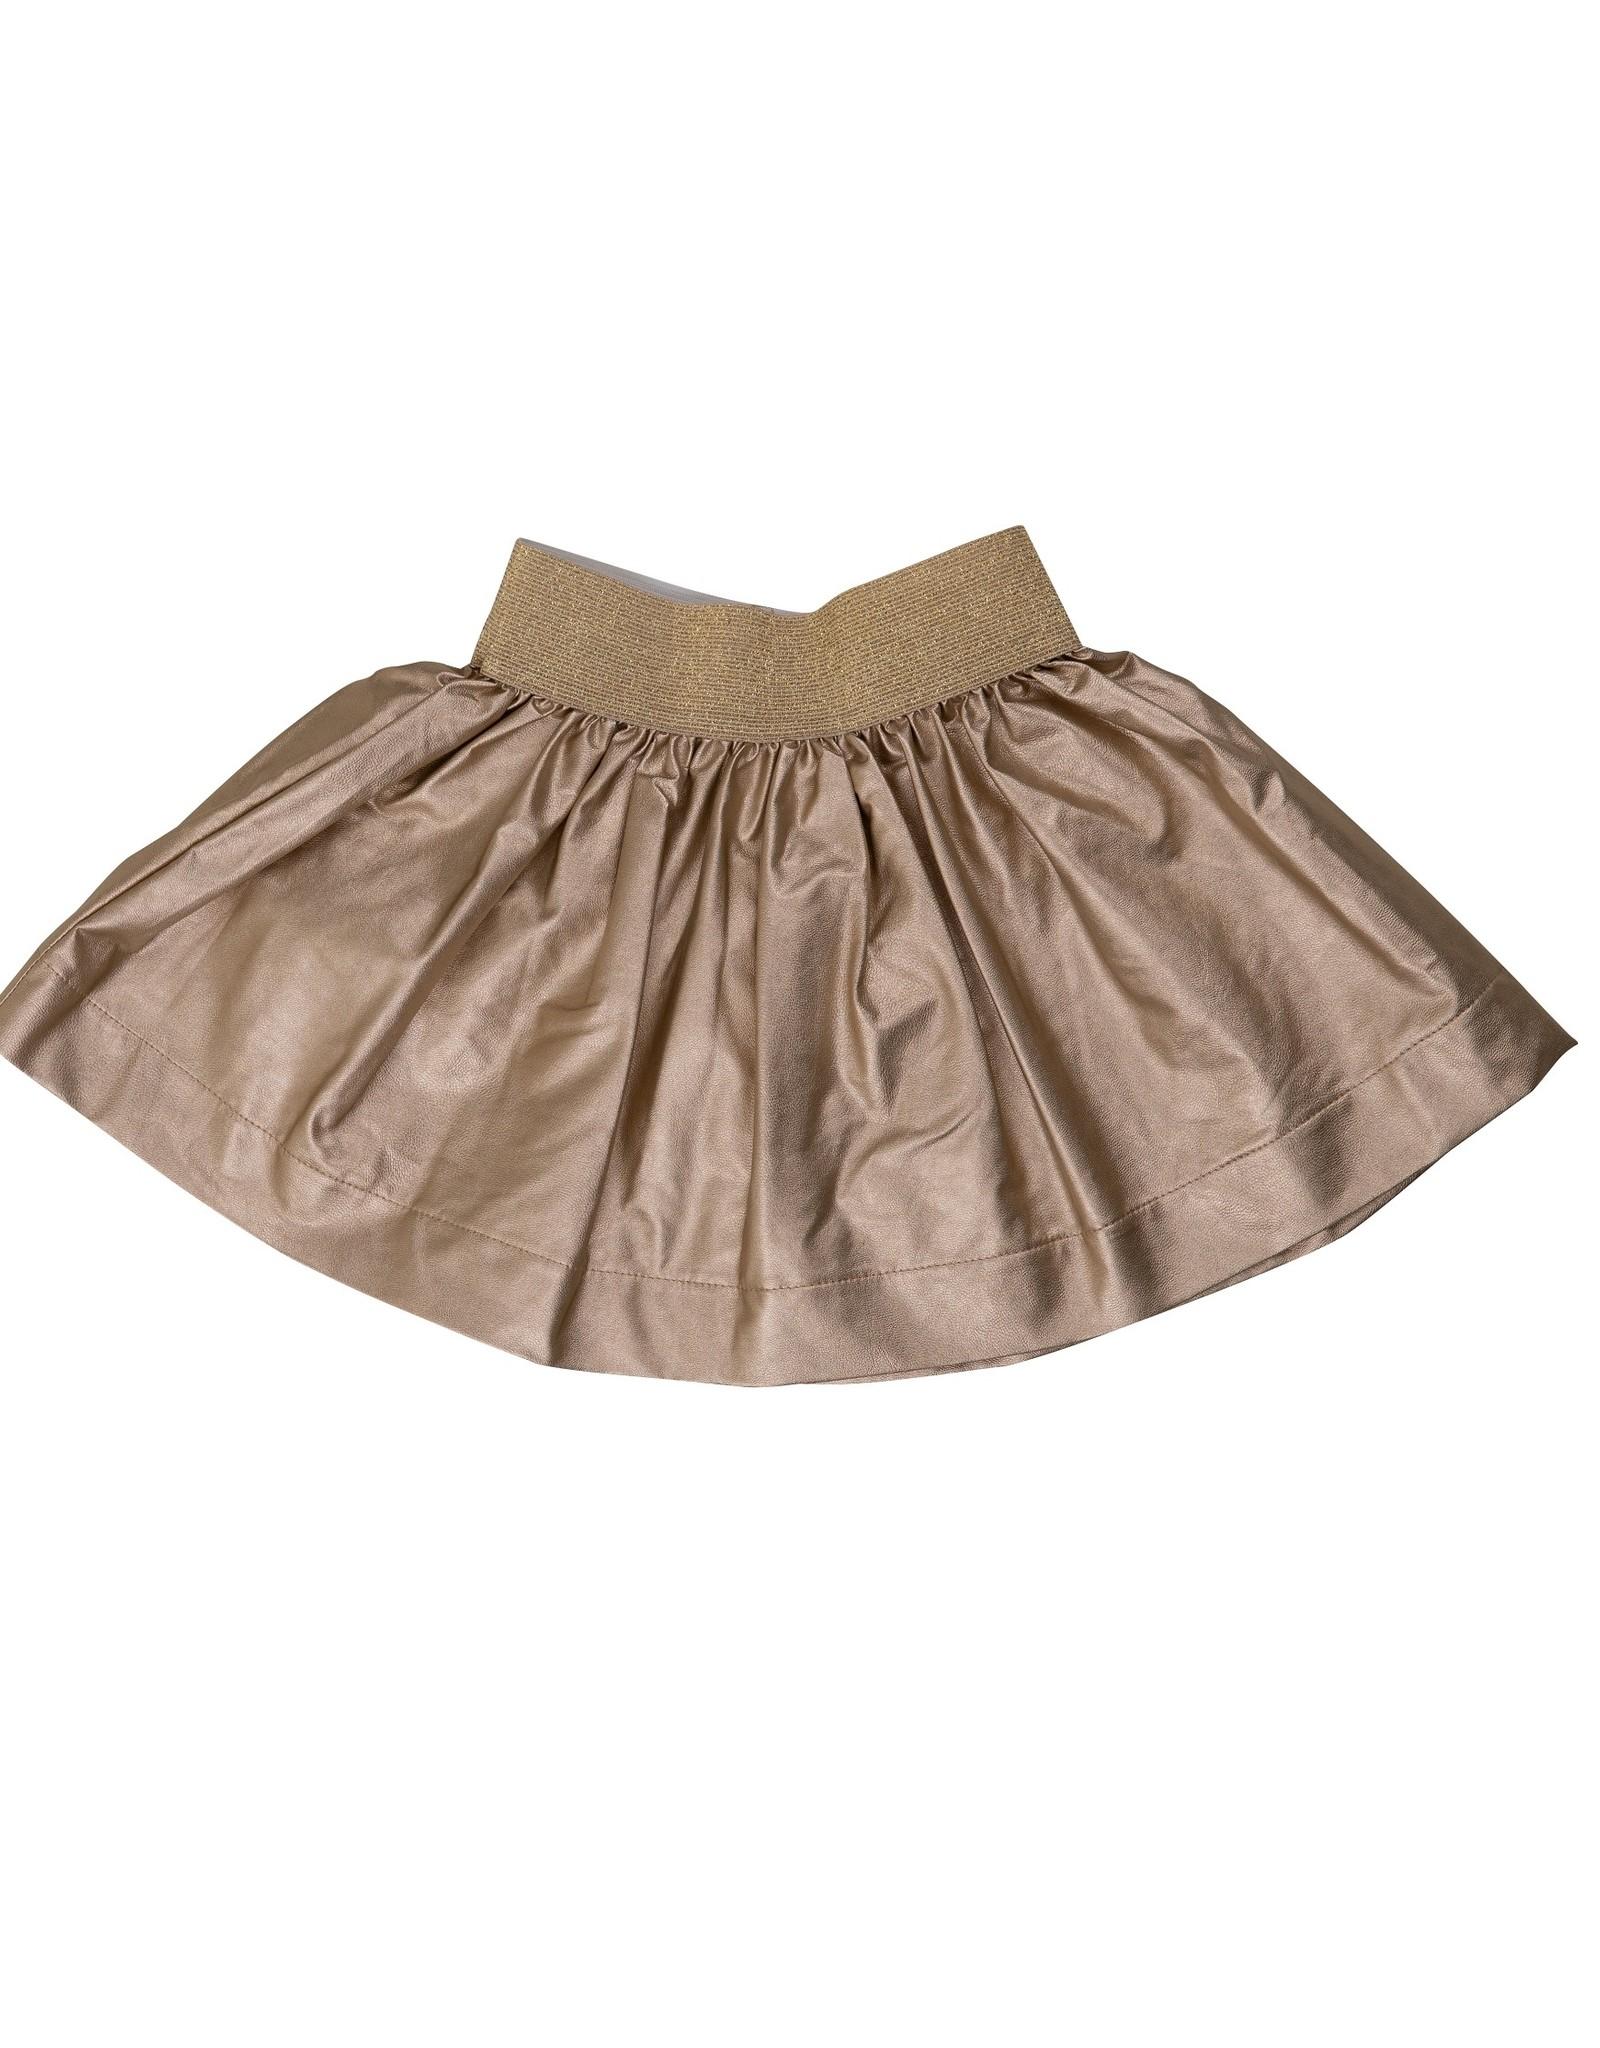 Big A Little a Big A Little a Metallic Faux Leather Skirt